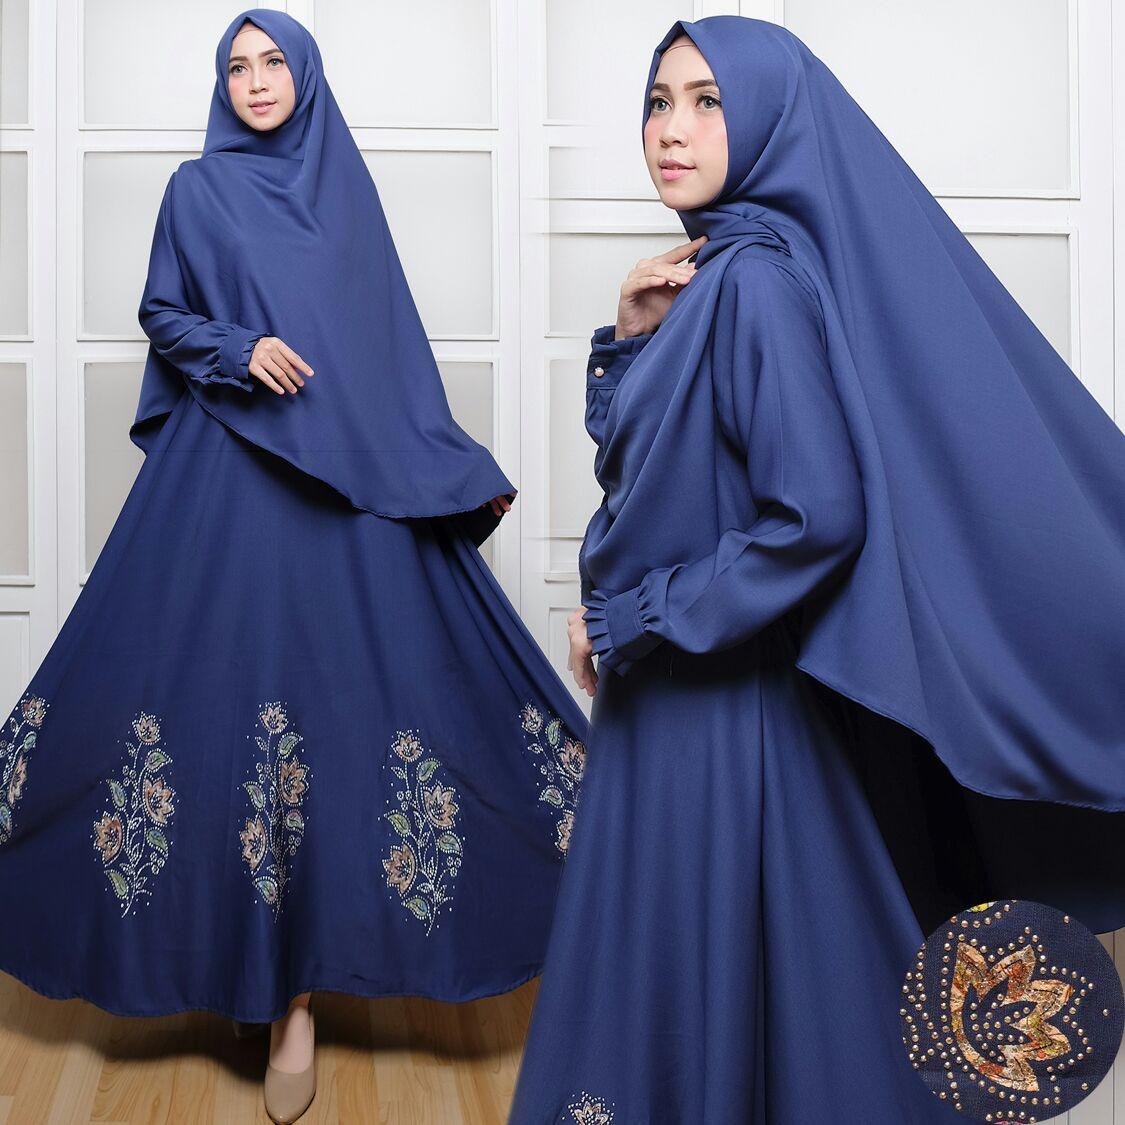 Gamis Syar I C017 Baloteli Payet Baju Muslim Cantik Butik Jingga